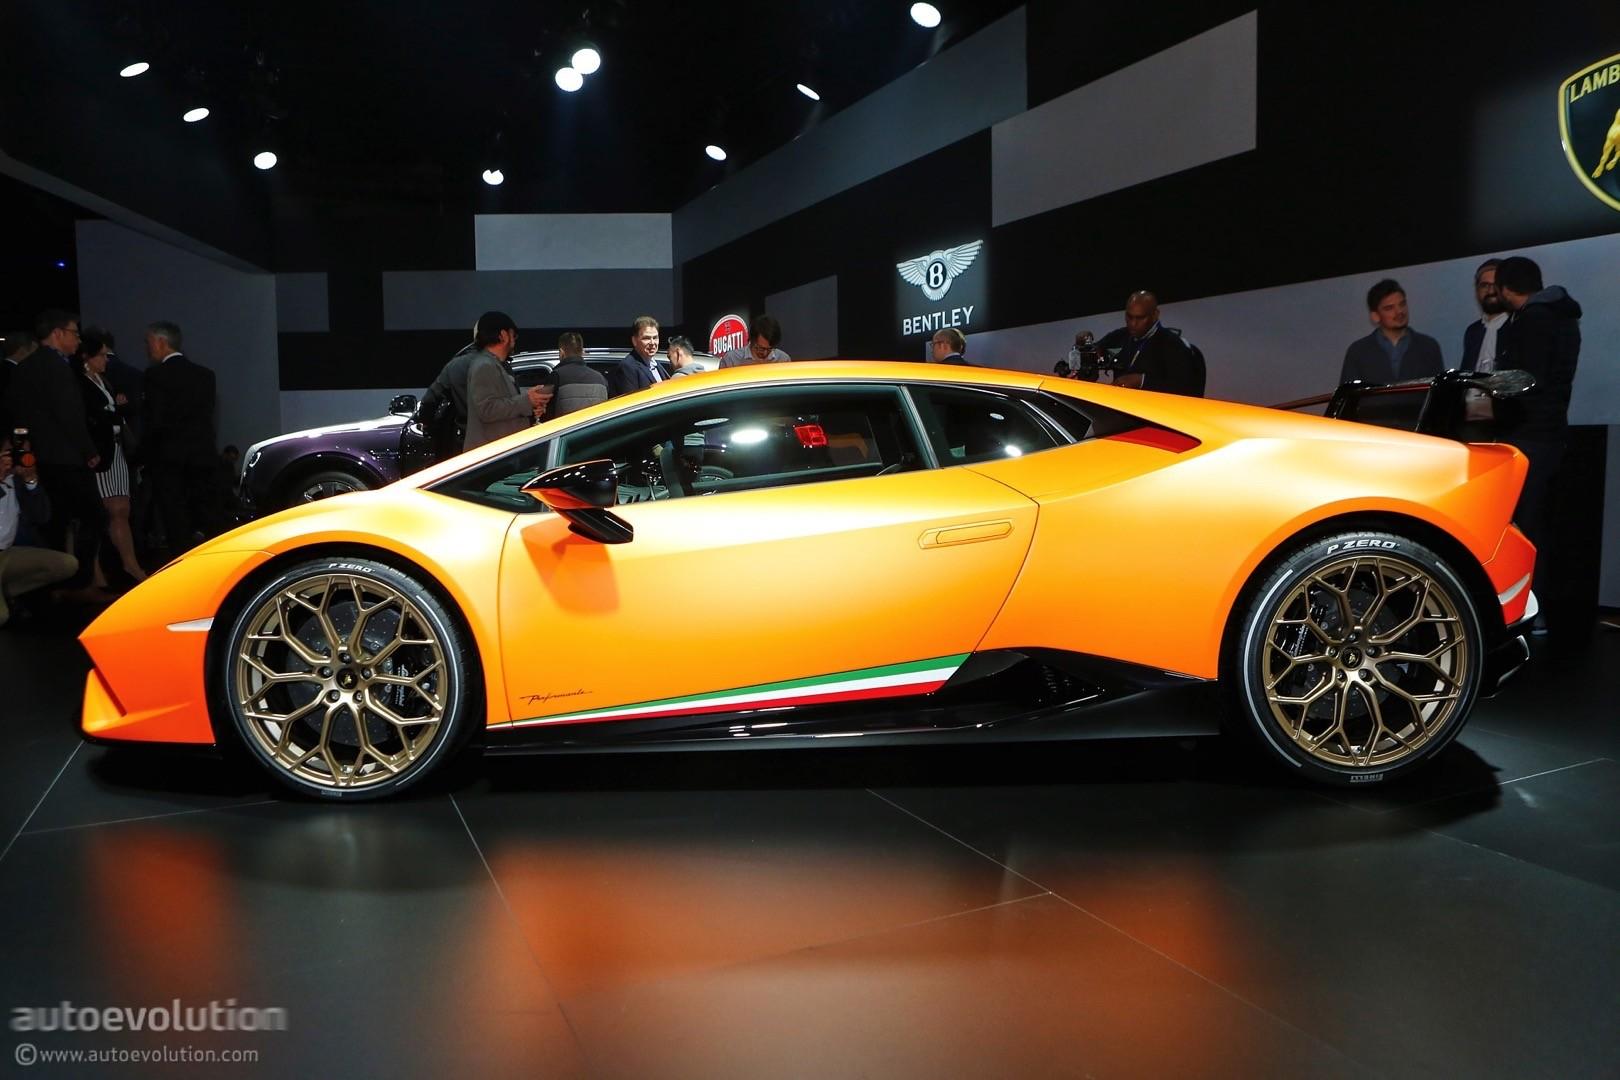 Incroyable ... Lamborghini Huracan Performante Live At 2017 Geneva Motor Show ...